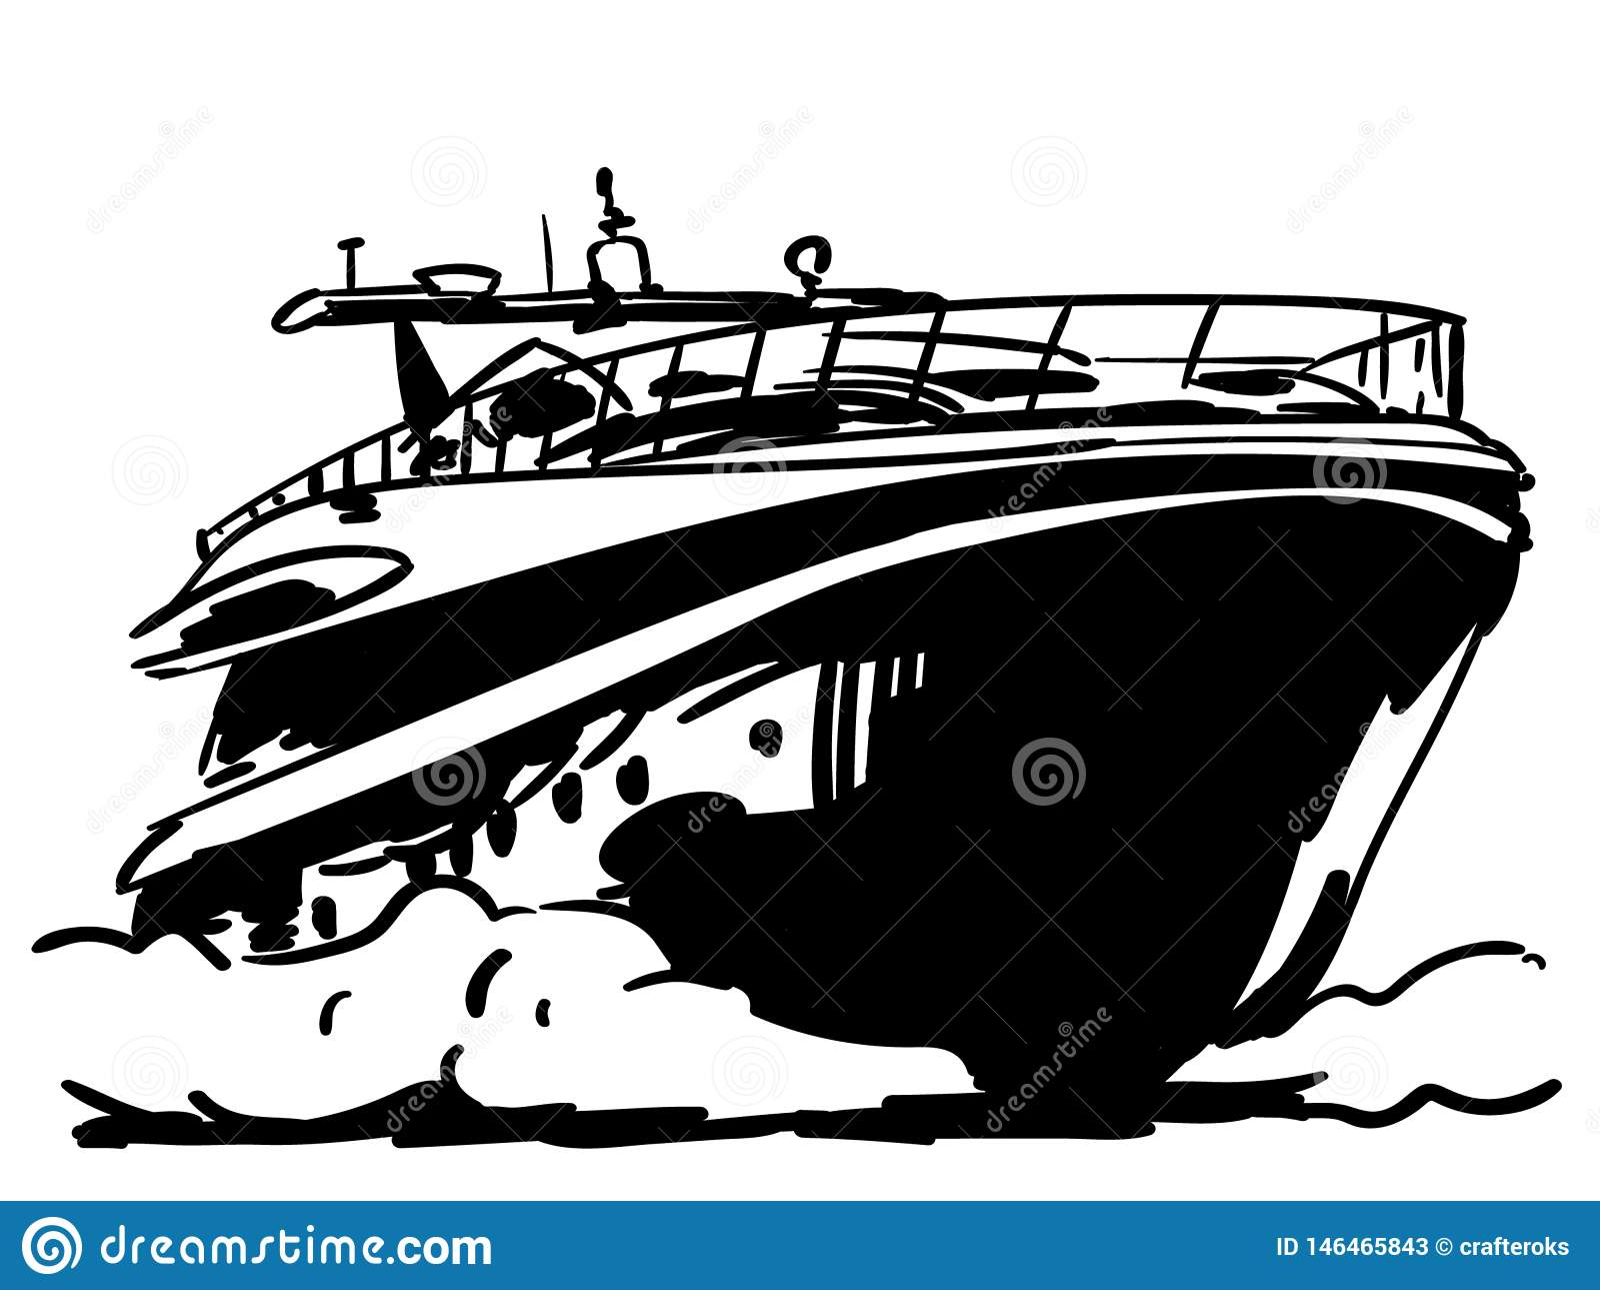 Yacht Vector Eps Vector, Eps, Logo, Icon, Silhouette